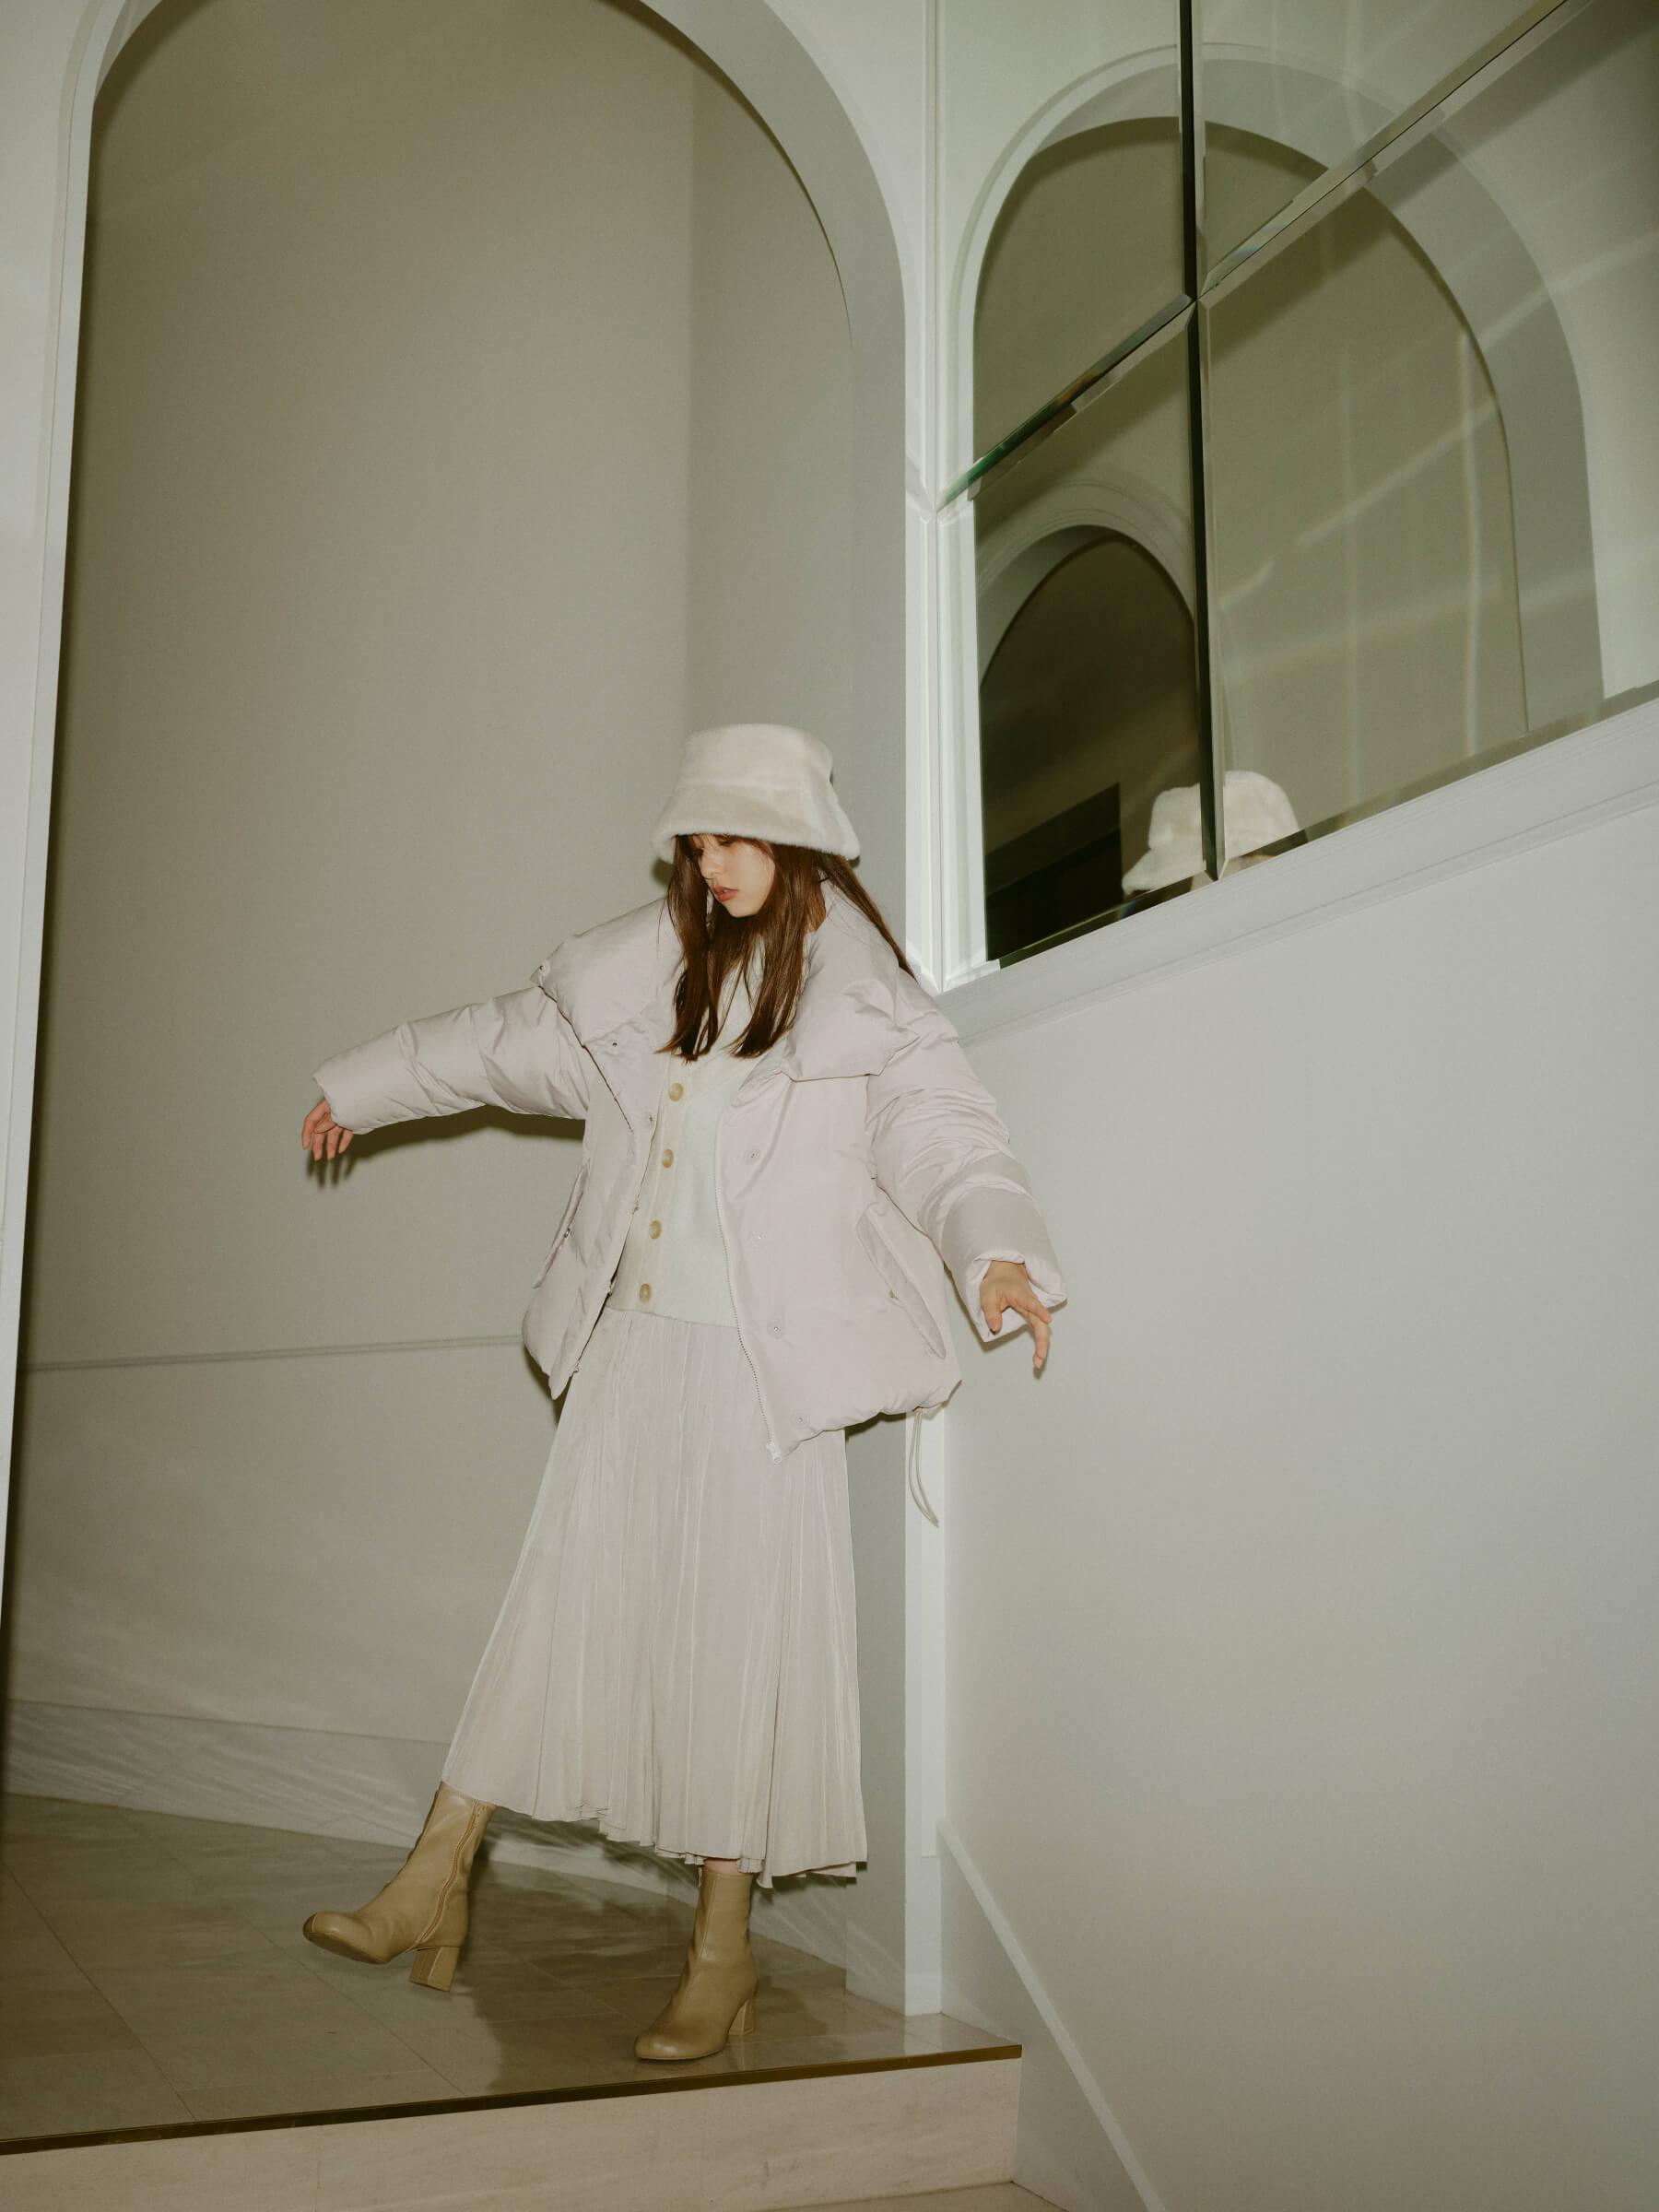 Coat 24,200yen , Knit 14,520yen , Skirt 9,900yen , Hat 7,590yen , Shoes 14,850yen